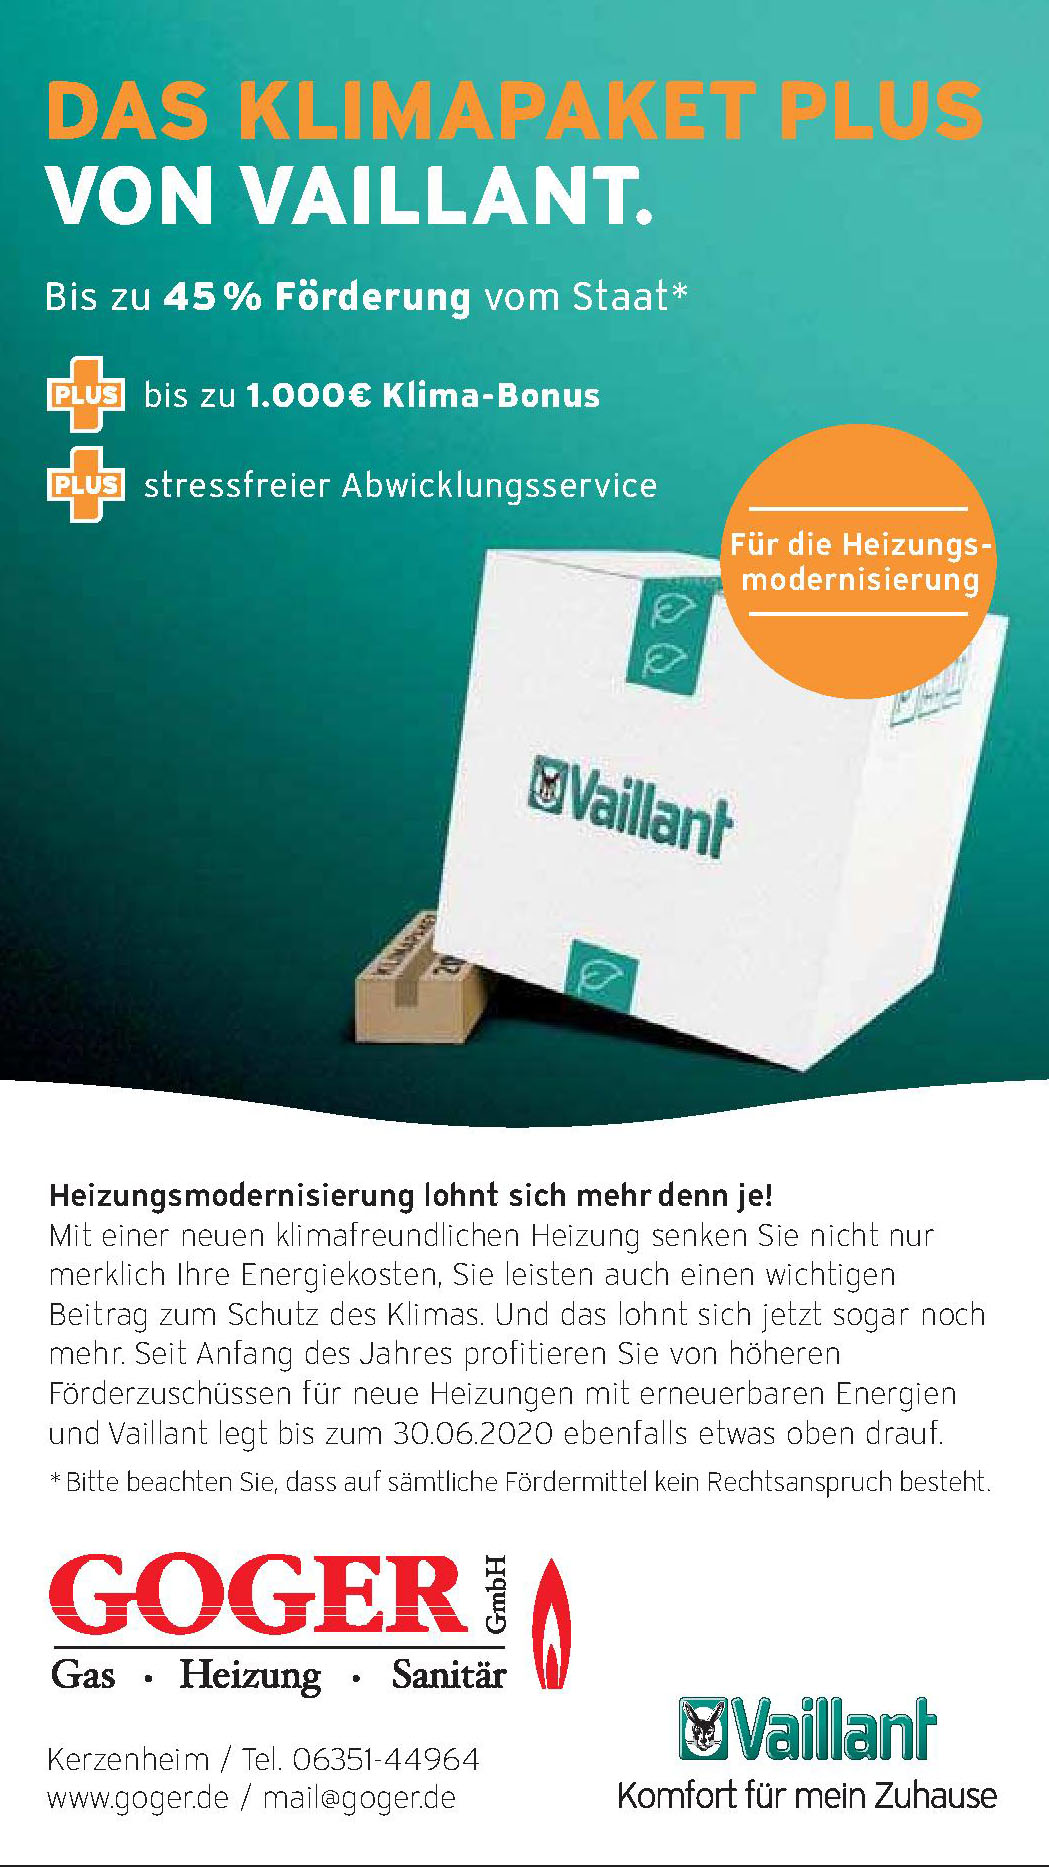 Goger GmbH